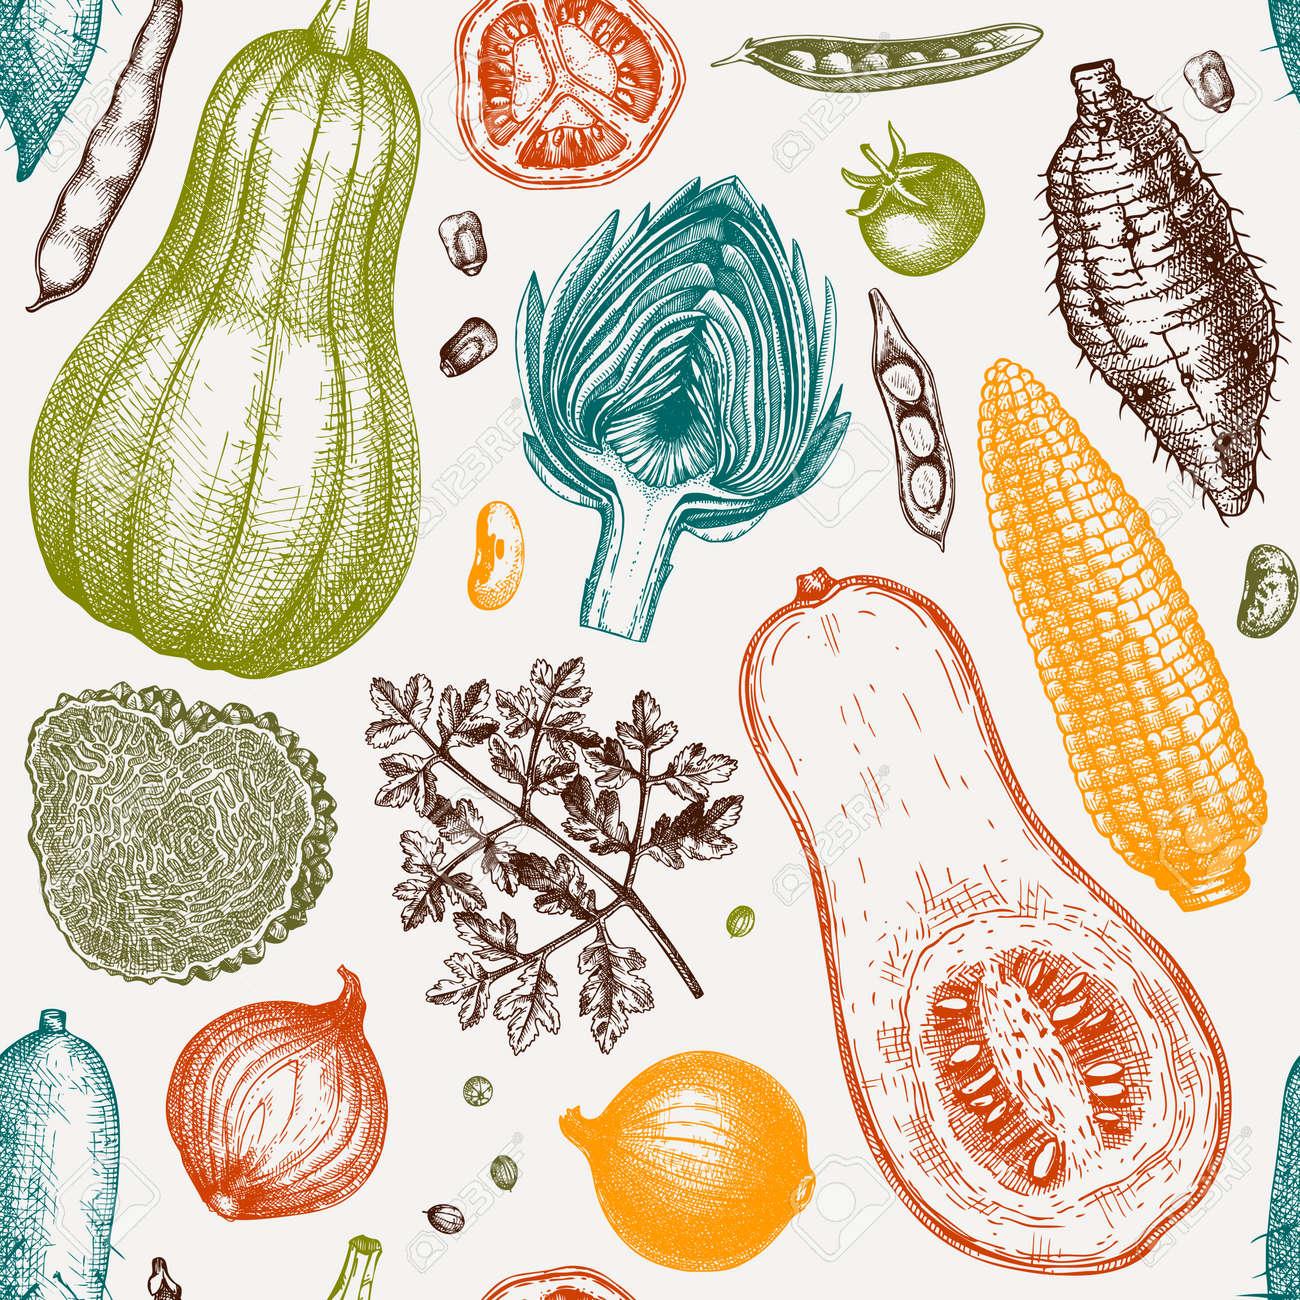 Seasonal vegetables seamless pattern. Harvest festival vector background. Hand sketched herbs, vegetables, mushrooms illustration. Health food ingredients backdrop - 170259579